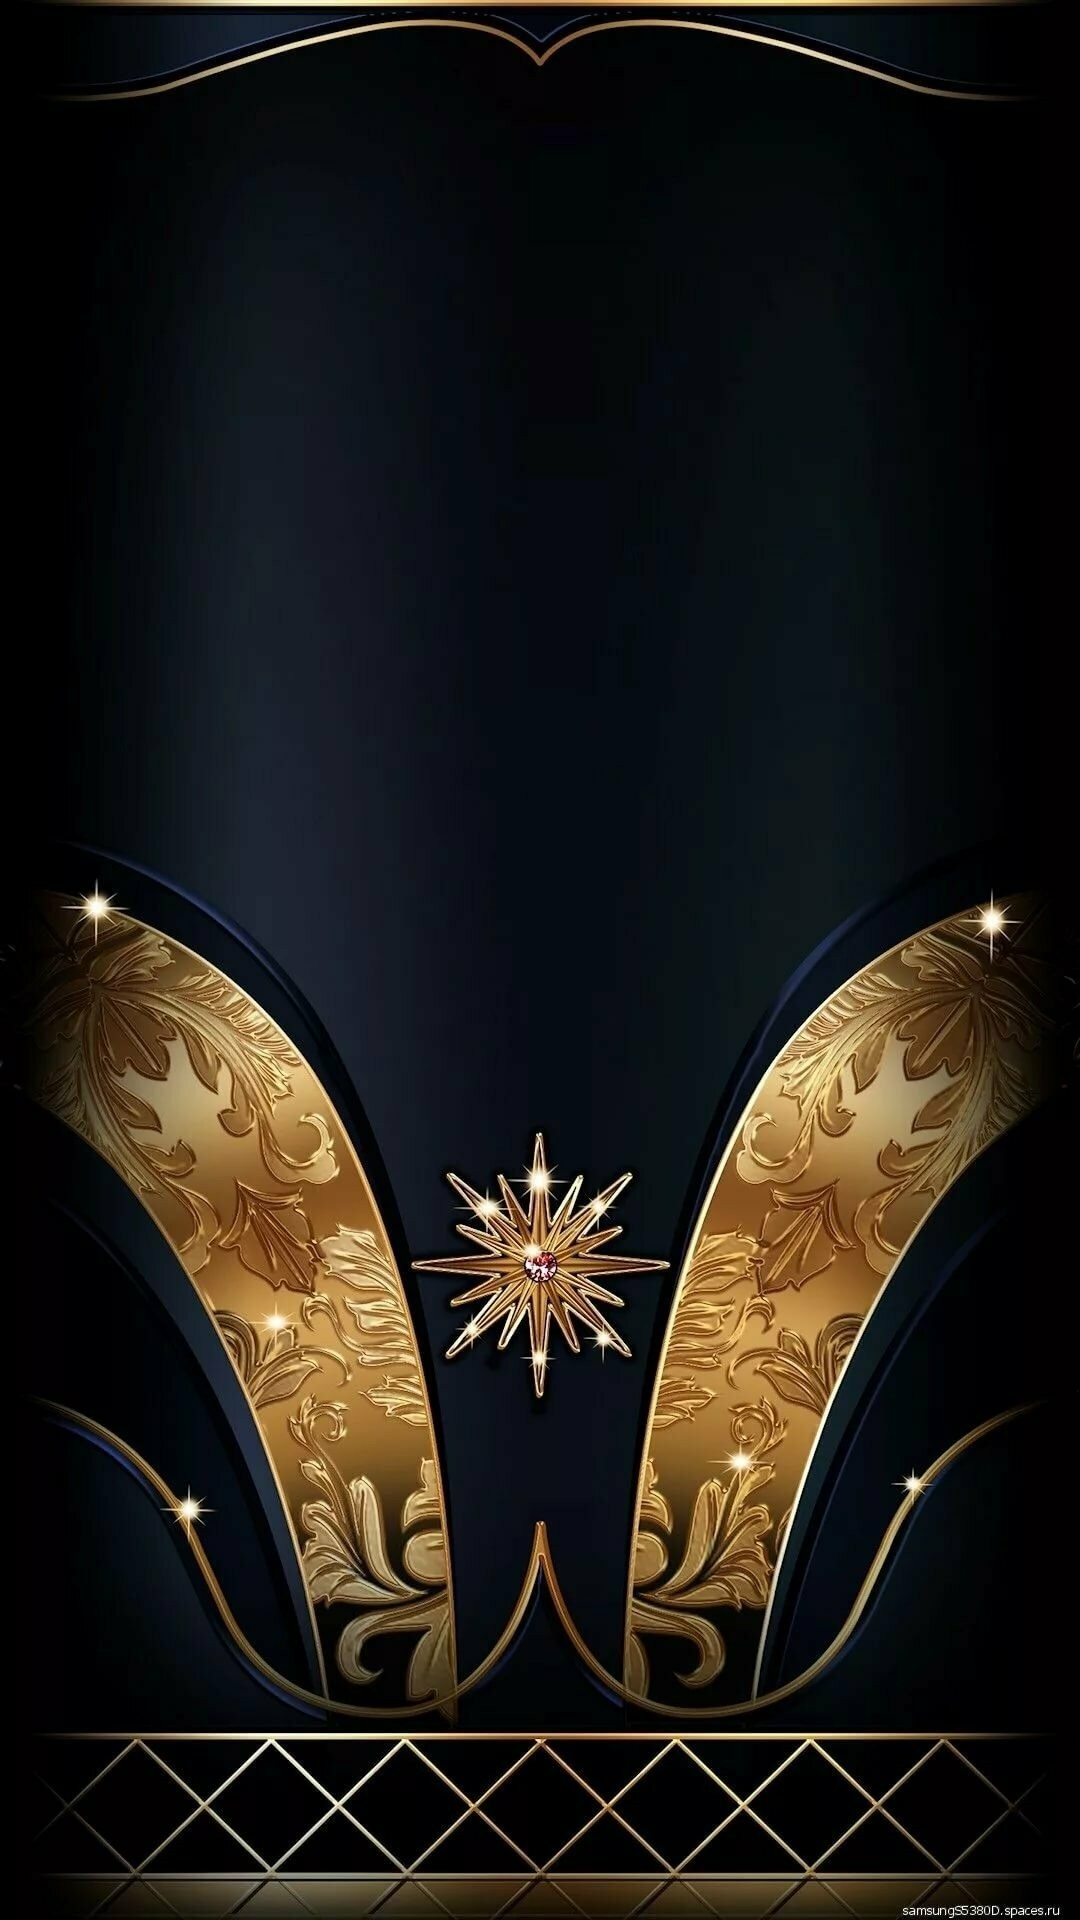 Gold phone wallpaper